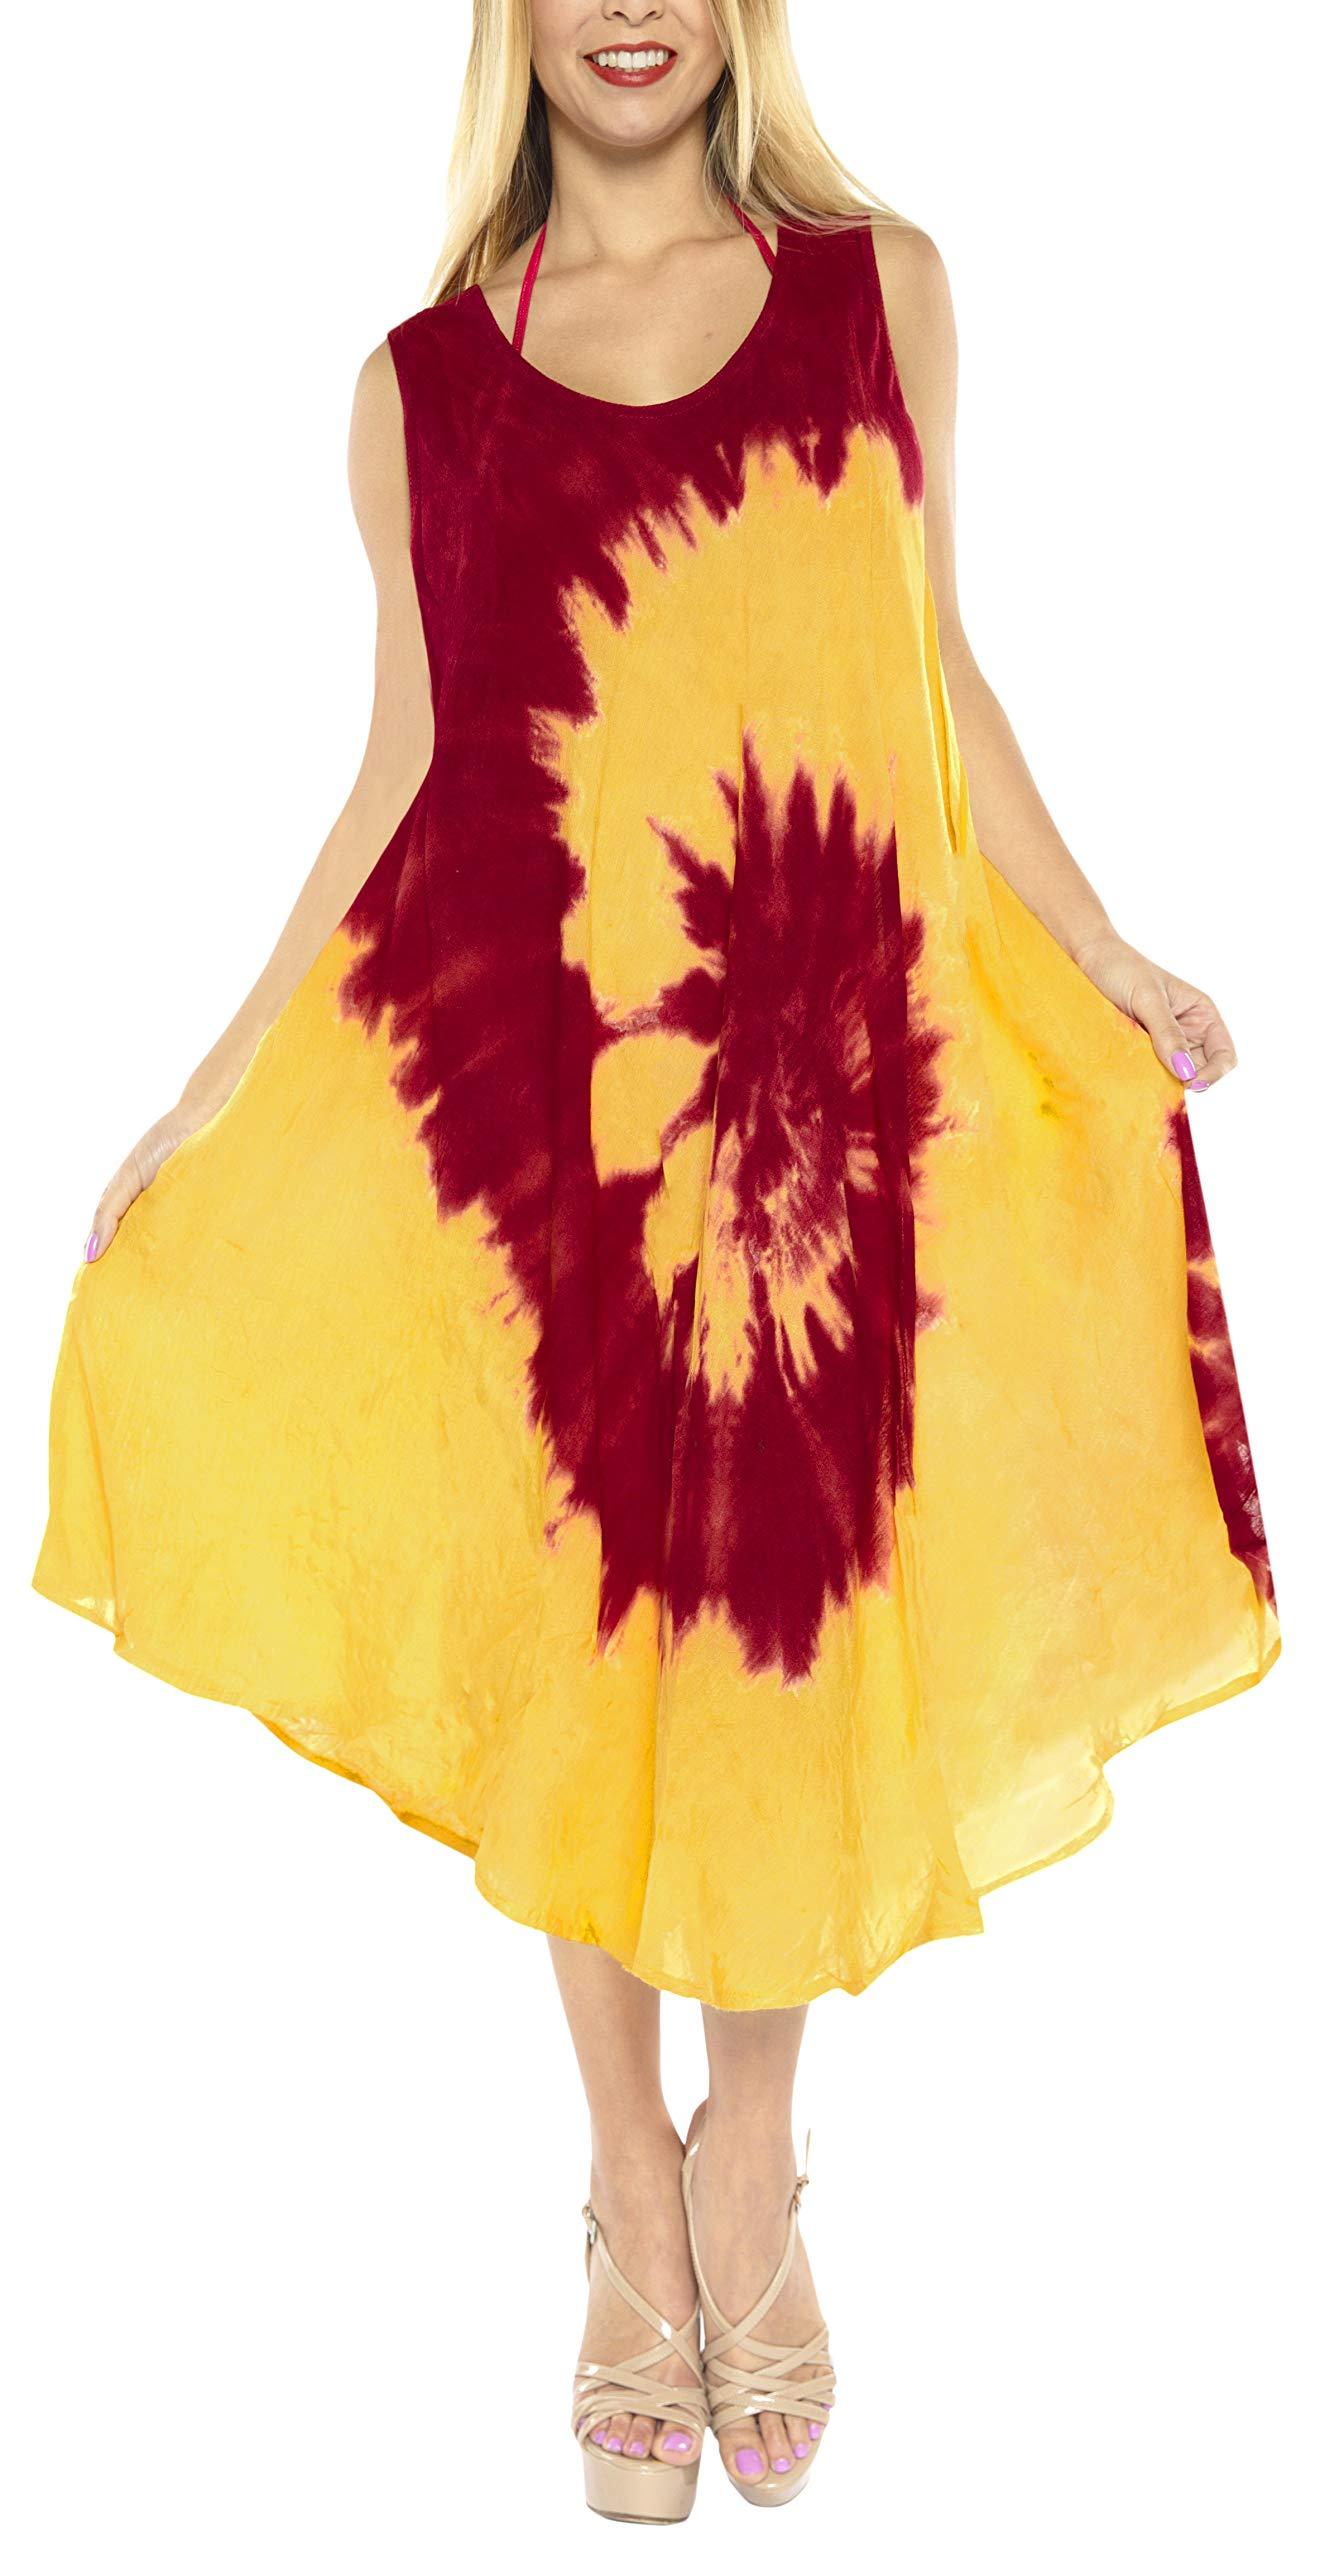 LA LEELA Rayon Tie Dye Swimwear Cover Up Top Caribbean Long  Red 585 Plus Size